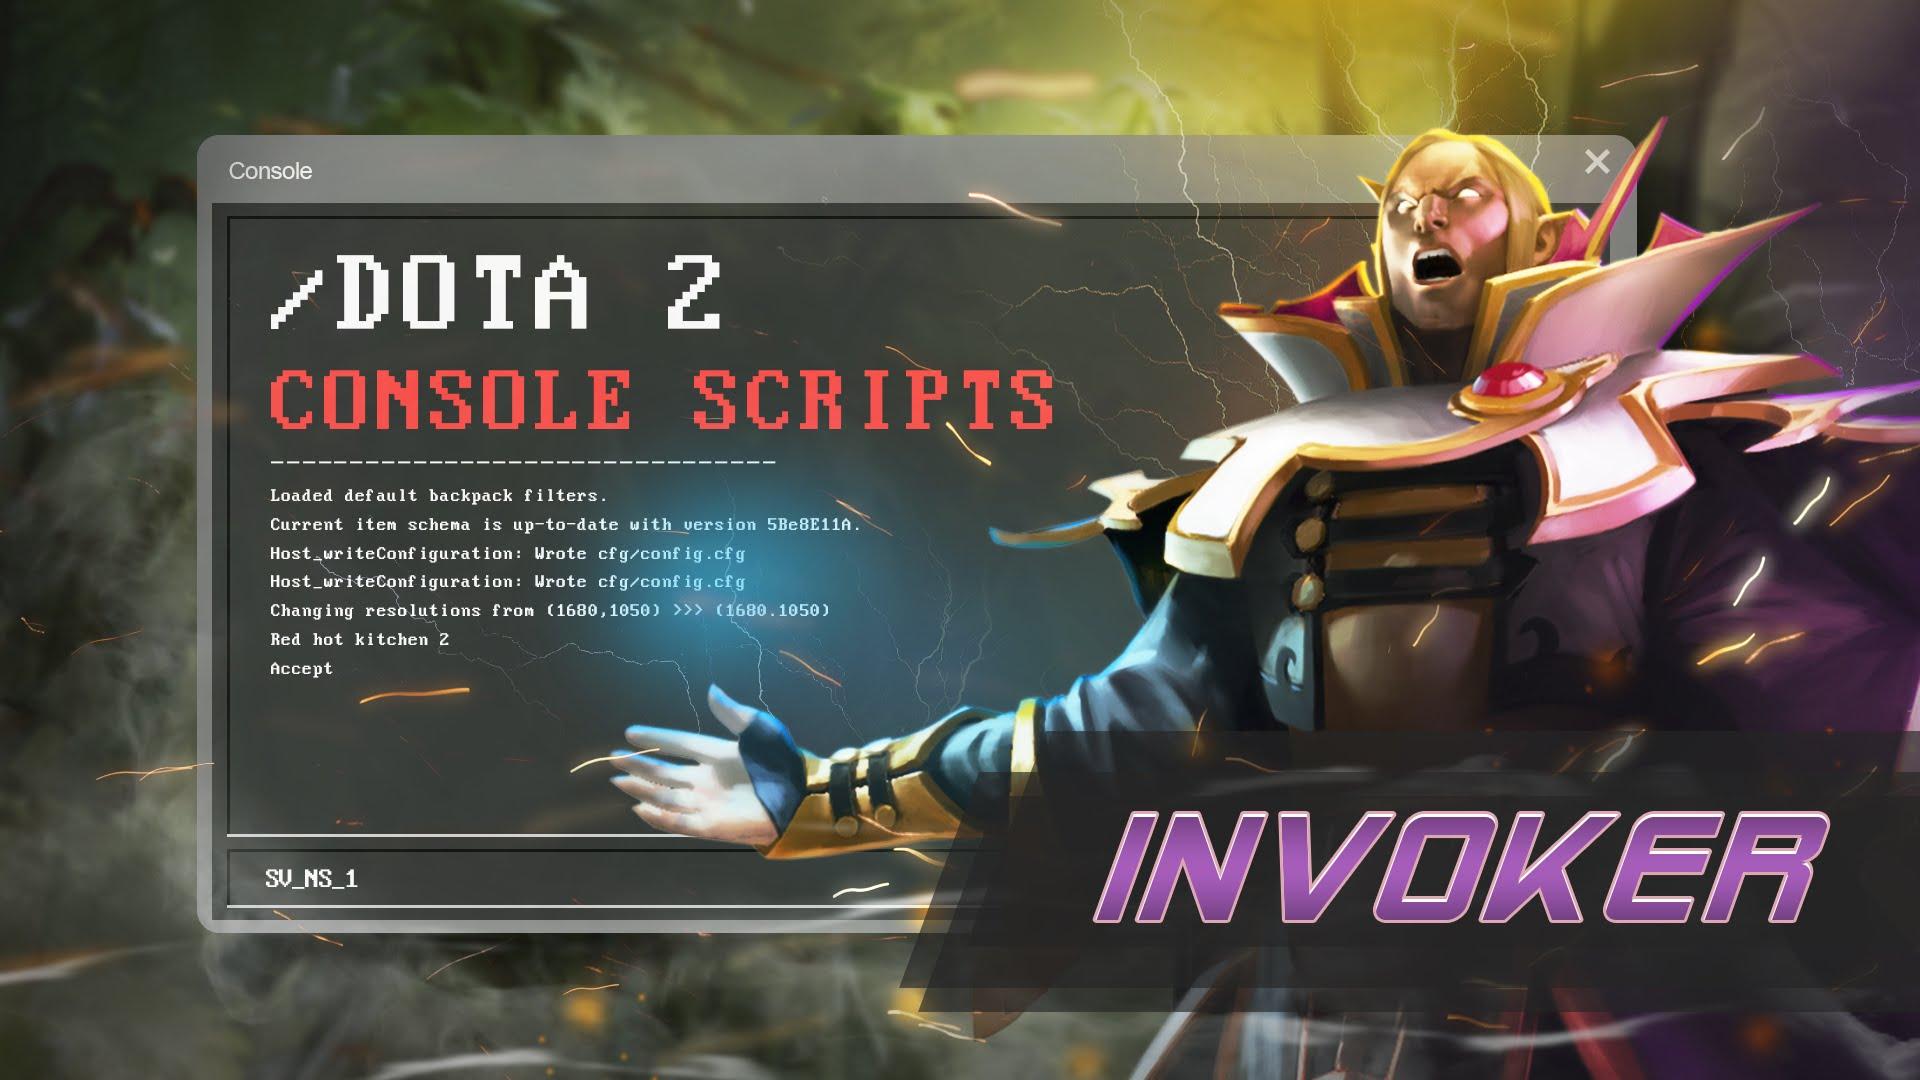 Скрипты на Invoker Дота 2